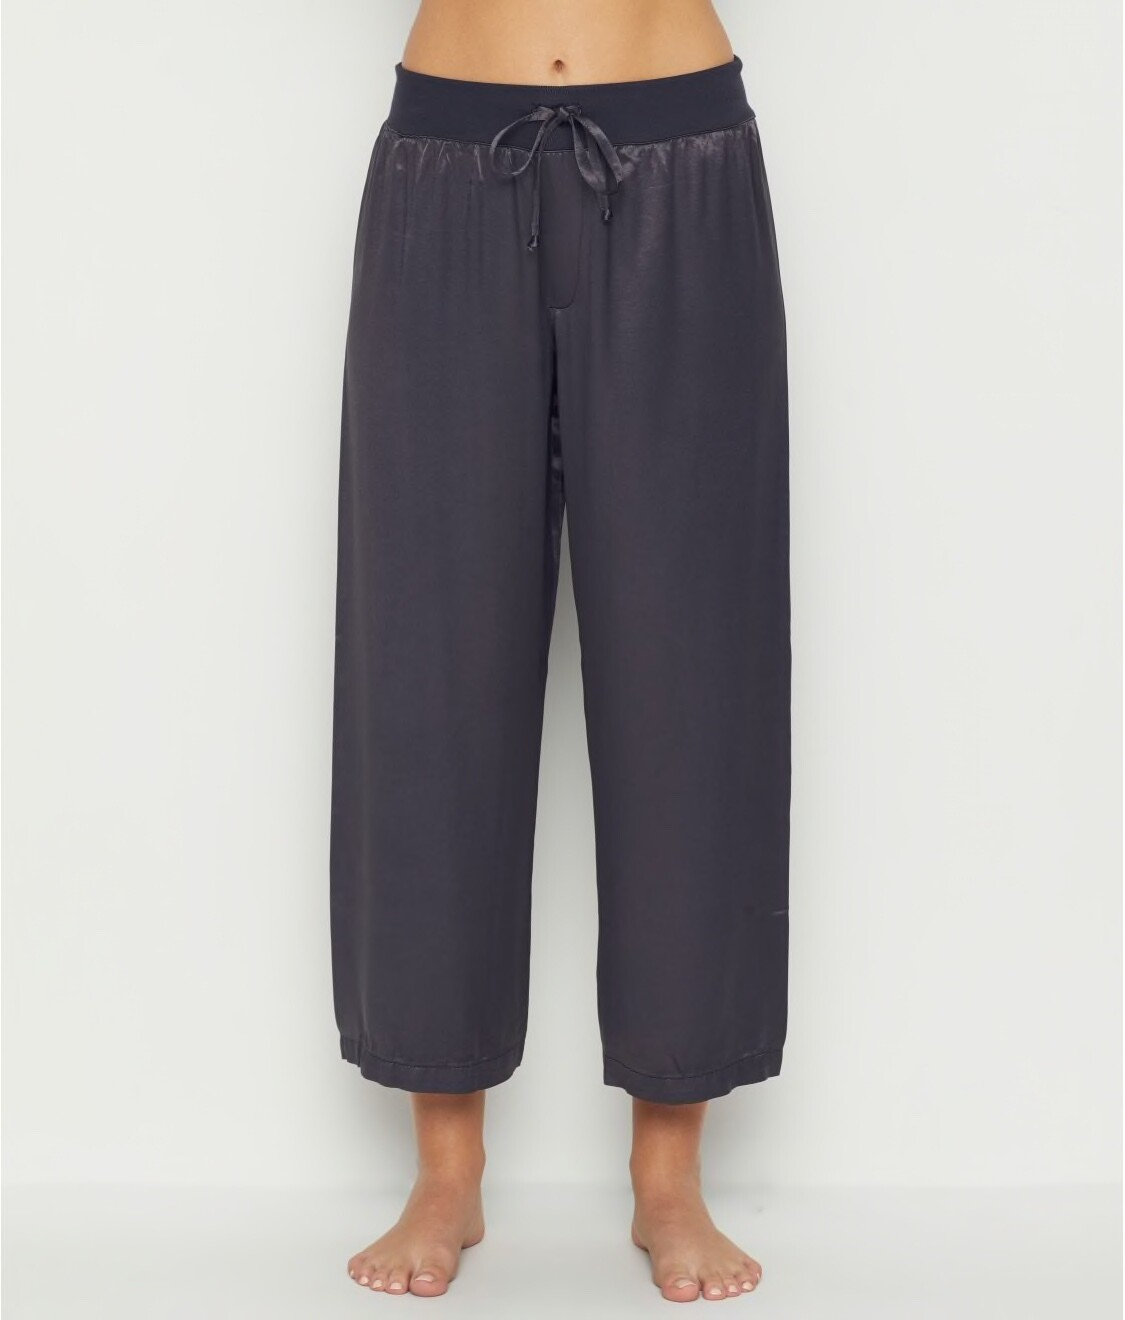 PJ Harlow Jolie Capri Satin Pants Navy L